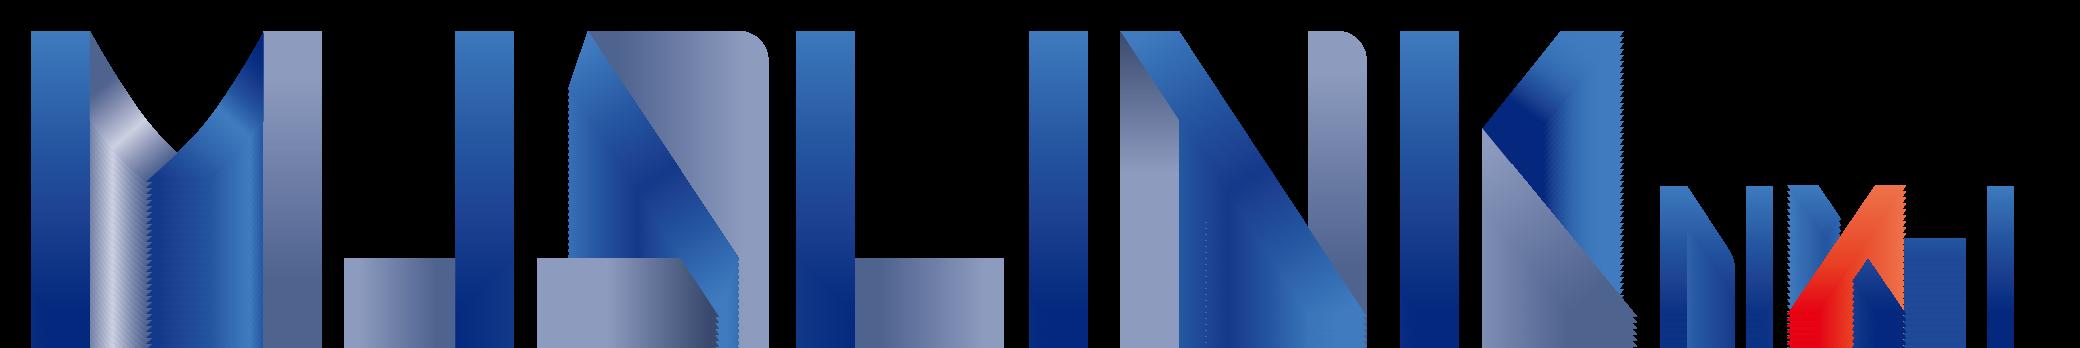 MJSLINK NX-I